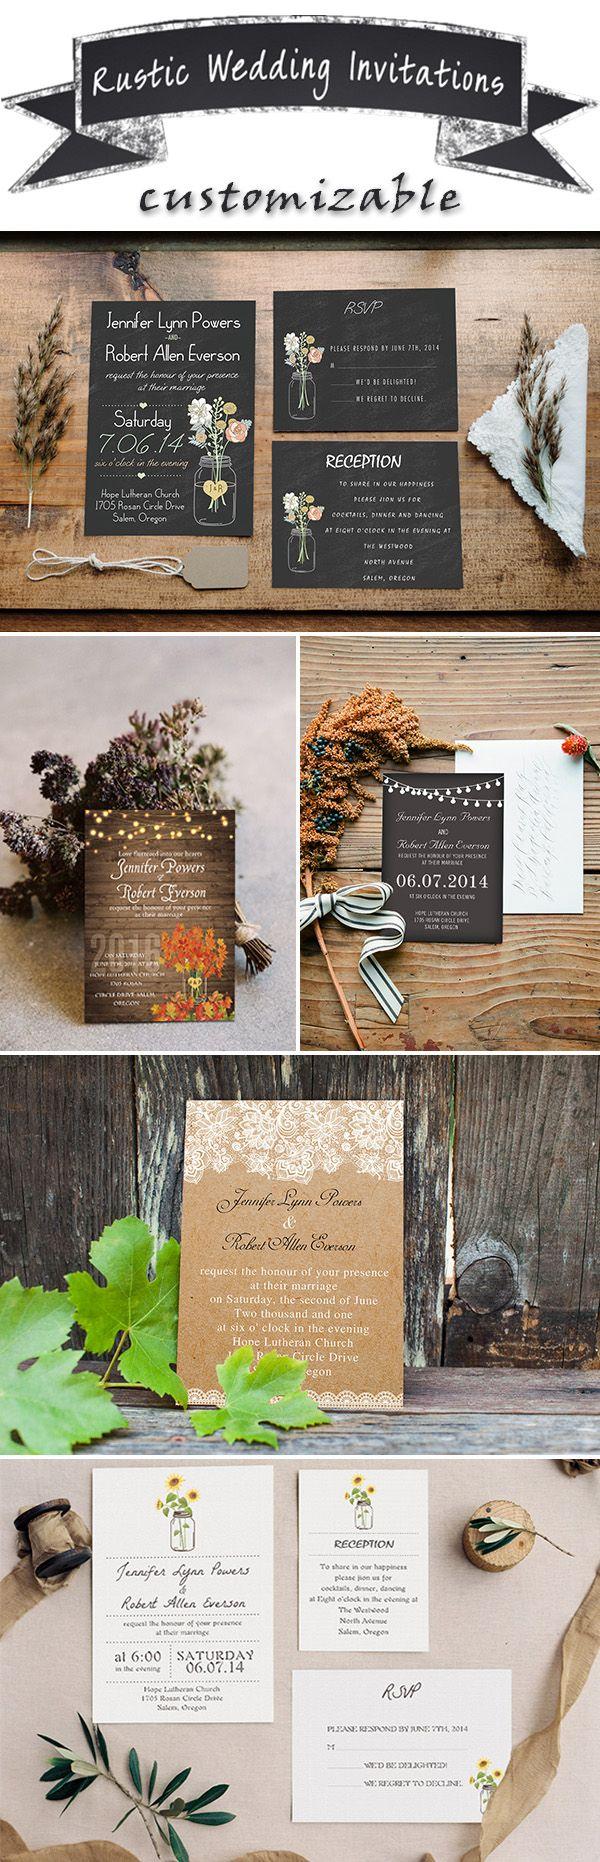 168 Best Rustic Wedding Invitations Images On Pinterest Wedding